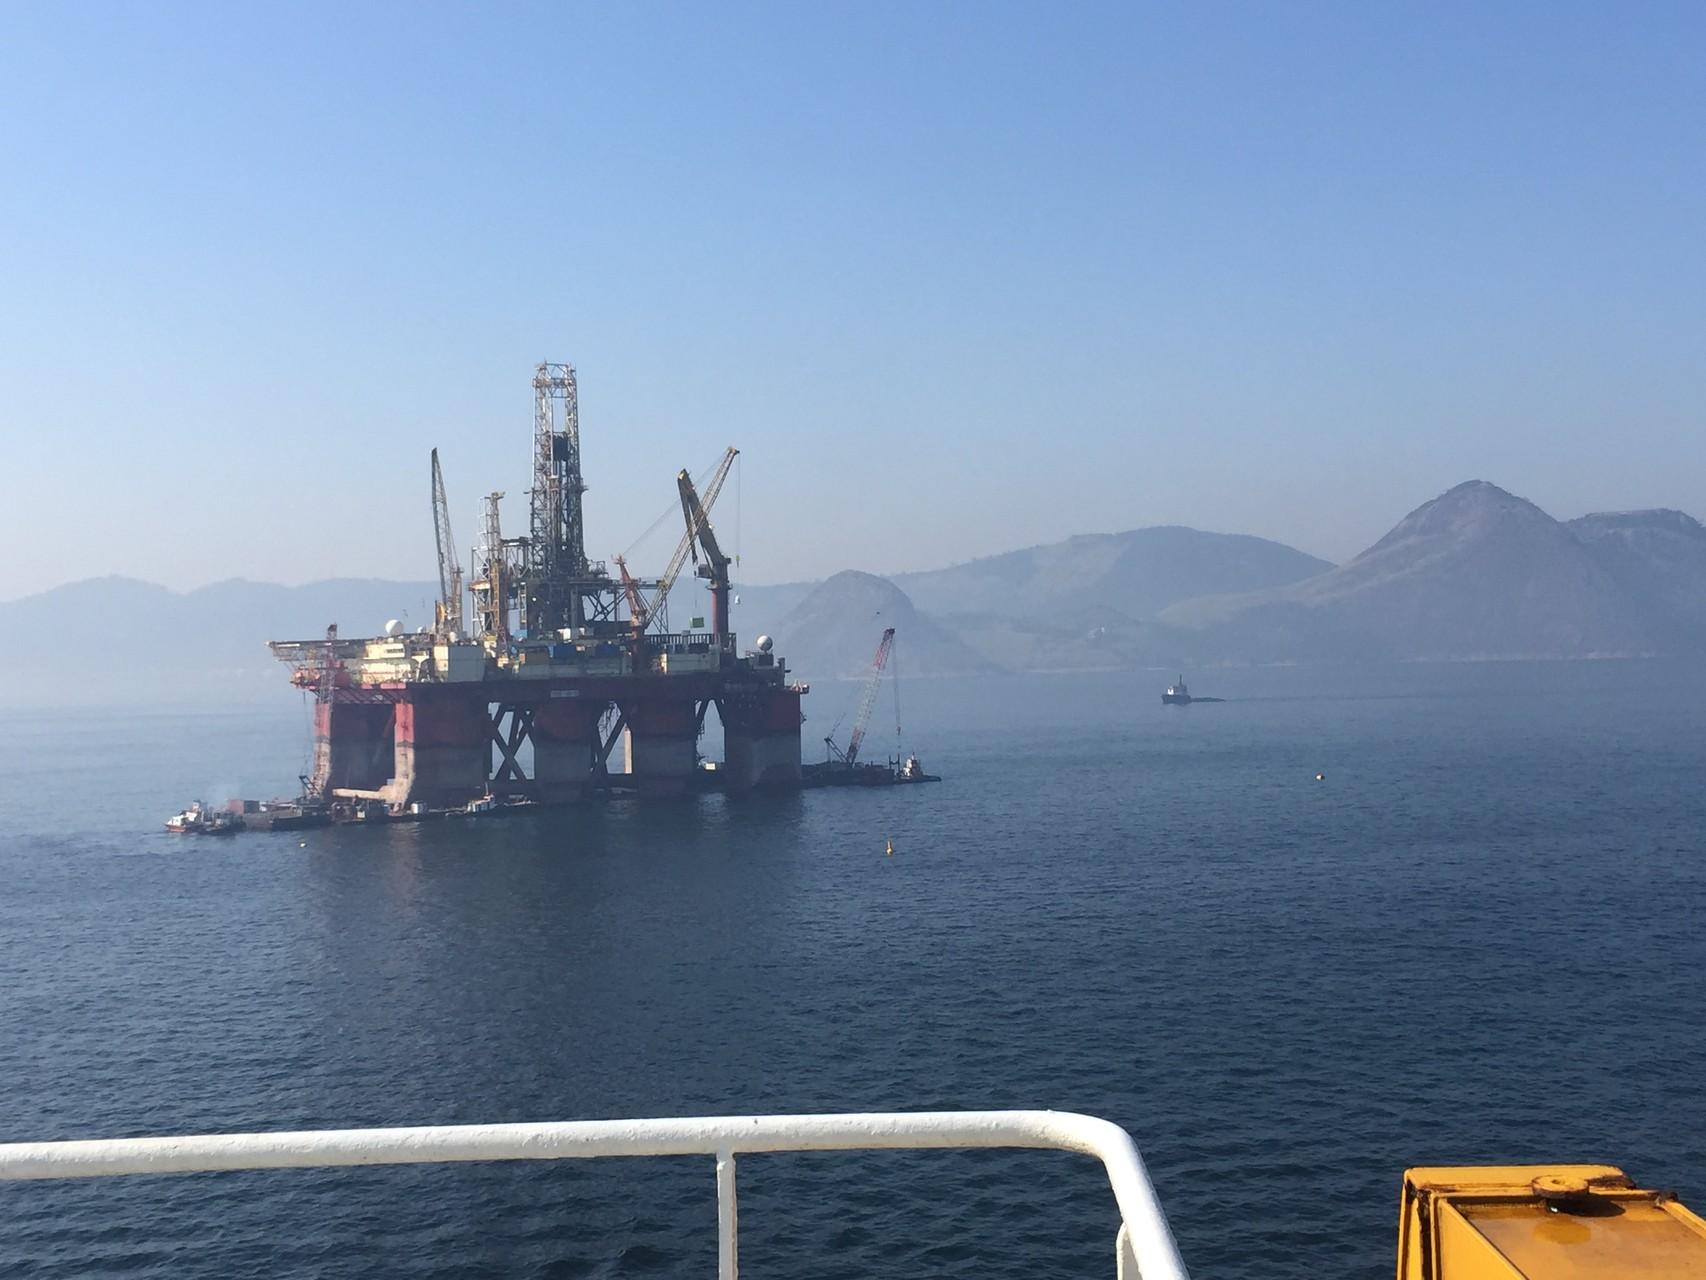 Vorbei an einem Ölturm